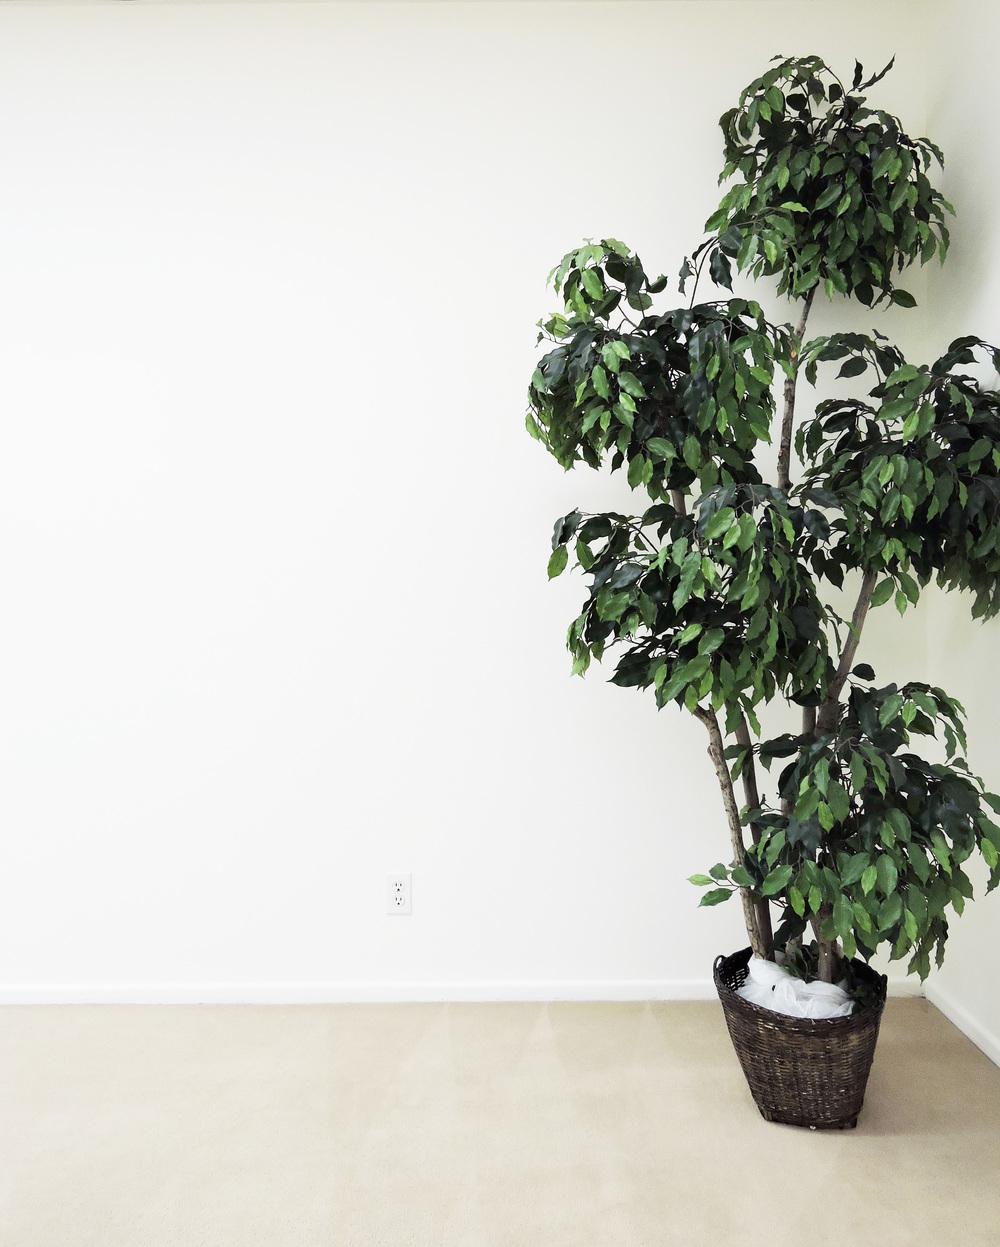 238-tree.jpg